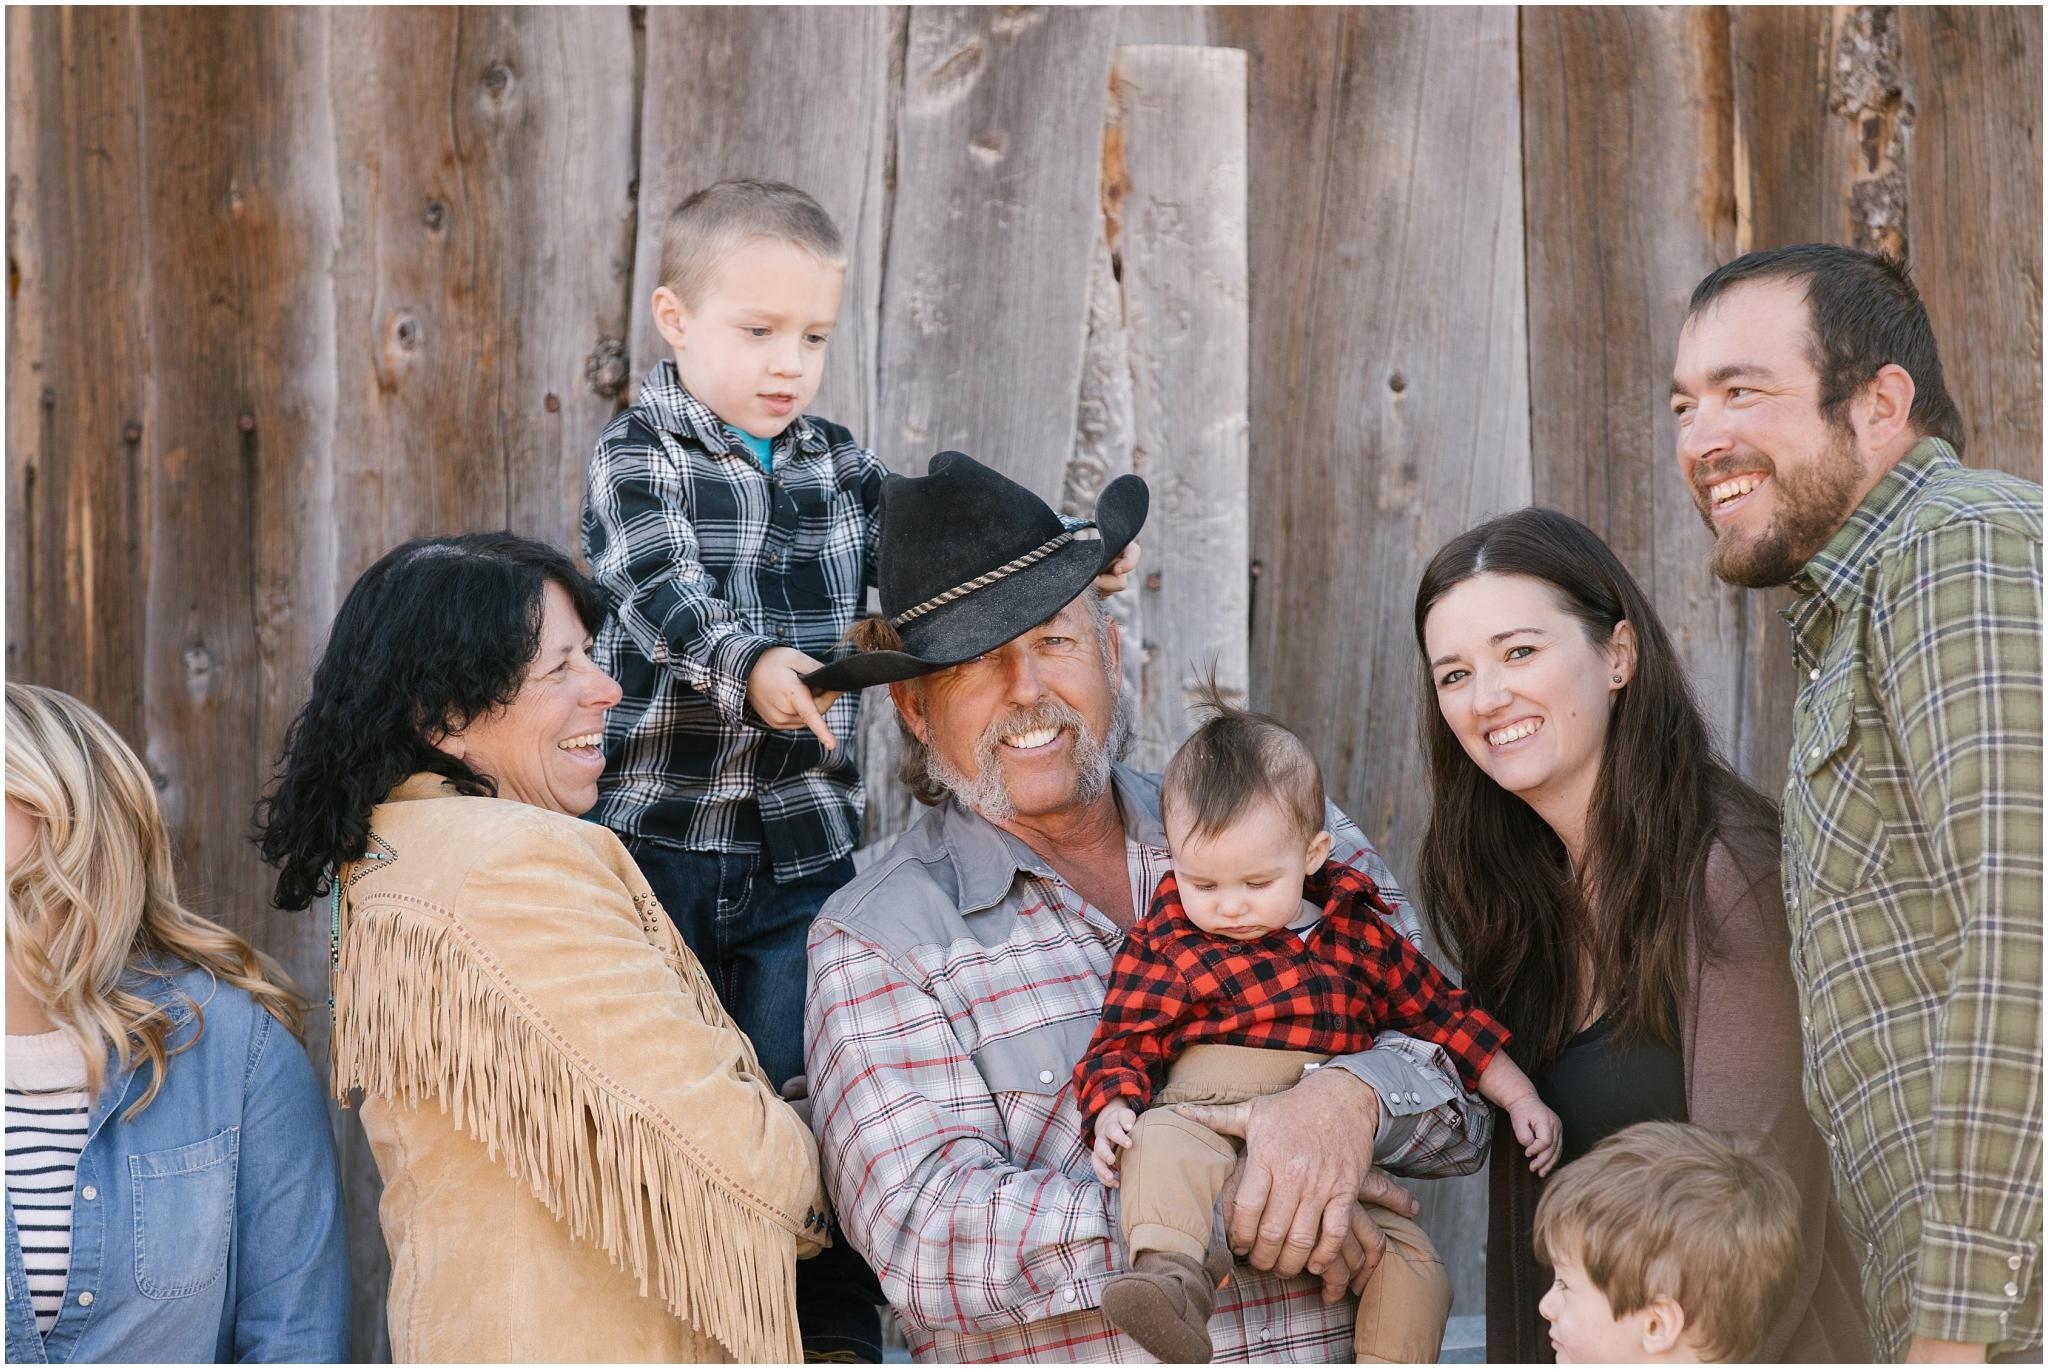 Conrad-59_Lizzie-B-Imagery-Utah-Family-Photographer-Utah-County-Central-Utah-Park-City-Extended-Family-Session.jpg